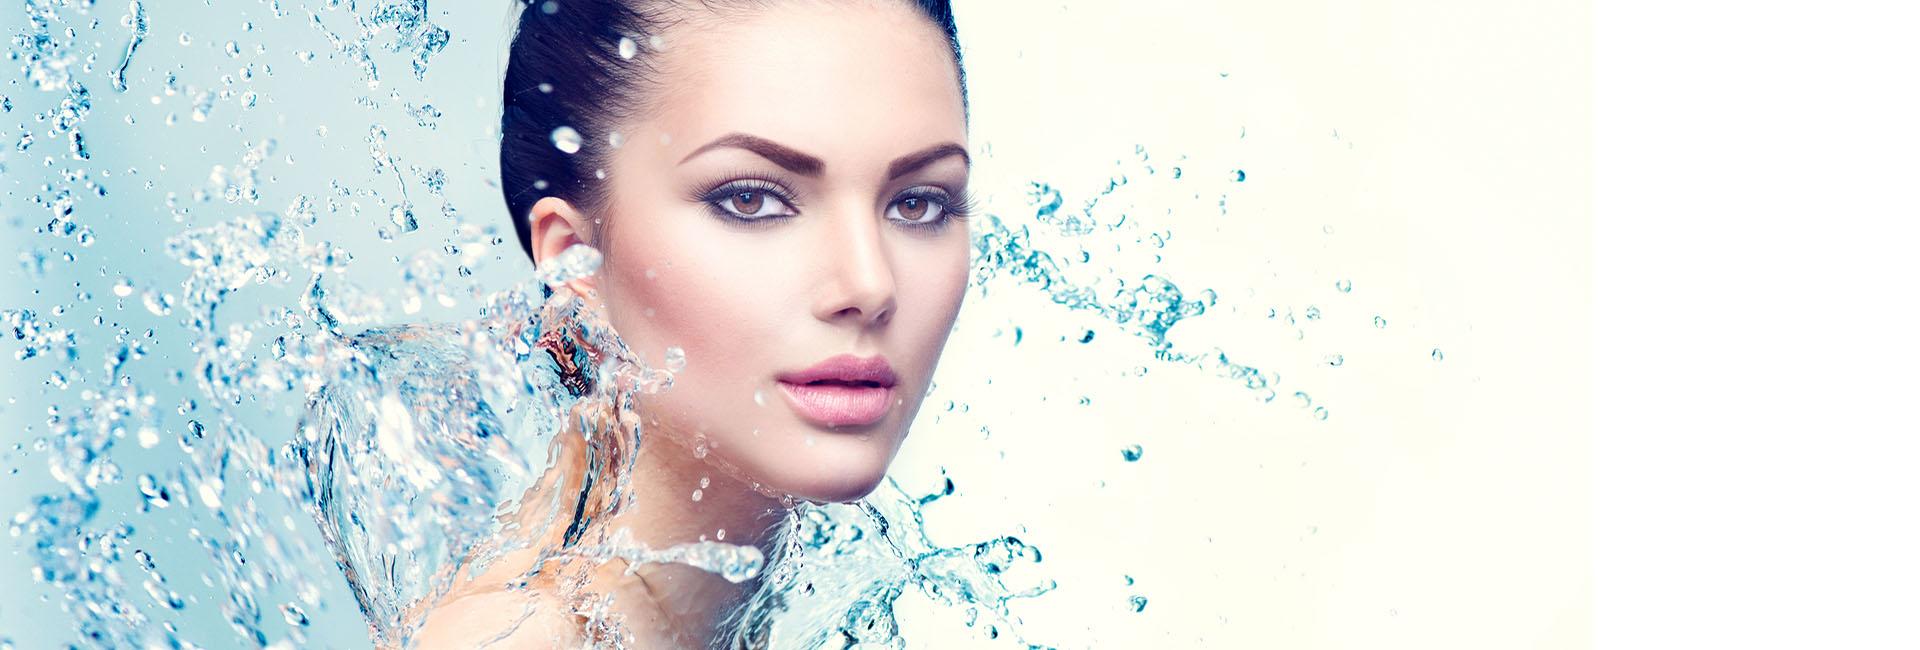 Hyaluron max skin boost – rétegelt hyaluronsav arcfeltöltés